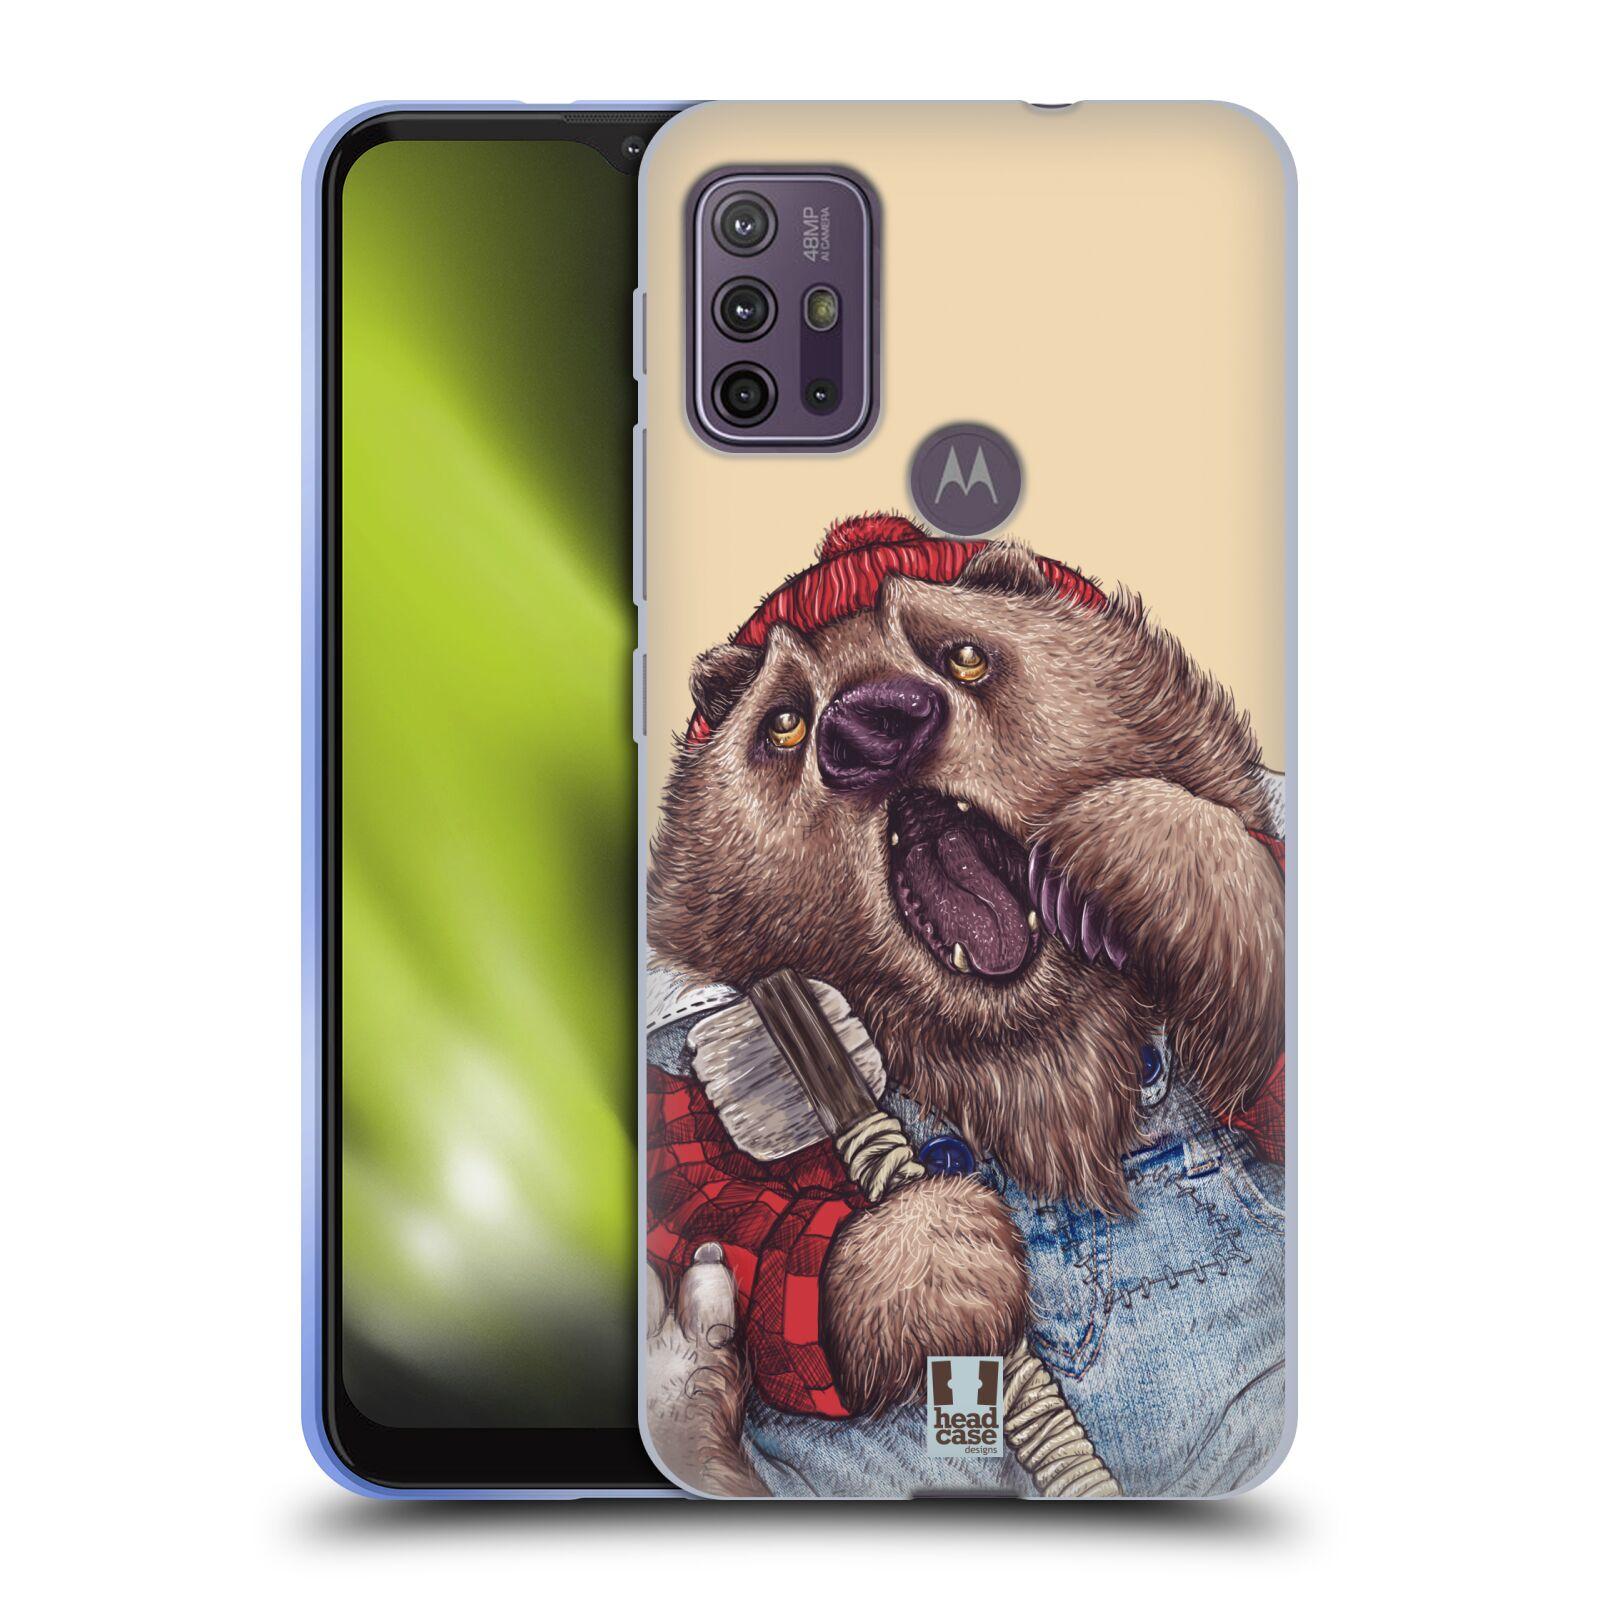 Silikonové pouzdro na mobil Motorola Moto G10 / G30 - Head Case - ANIMPLA MEDVĚD